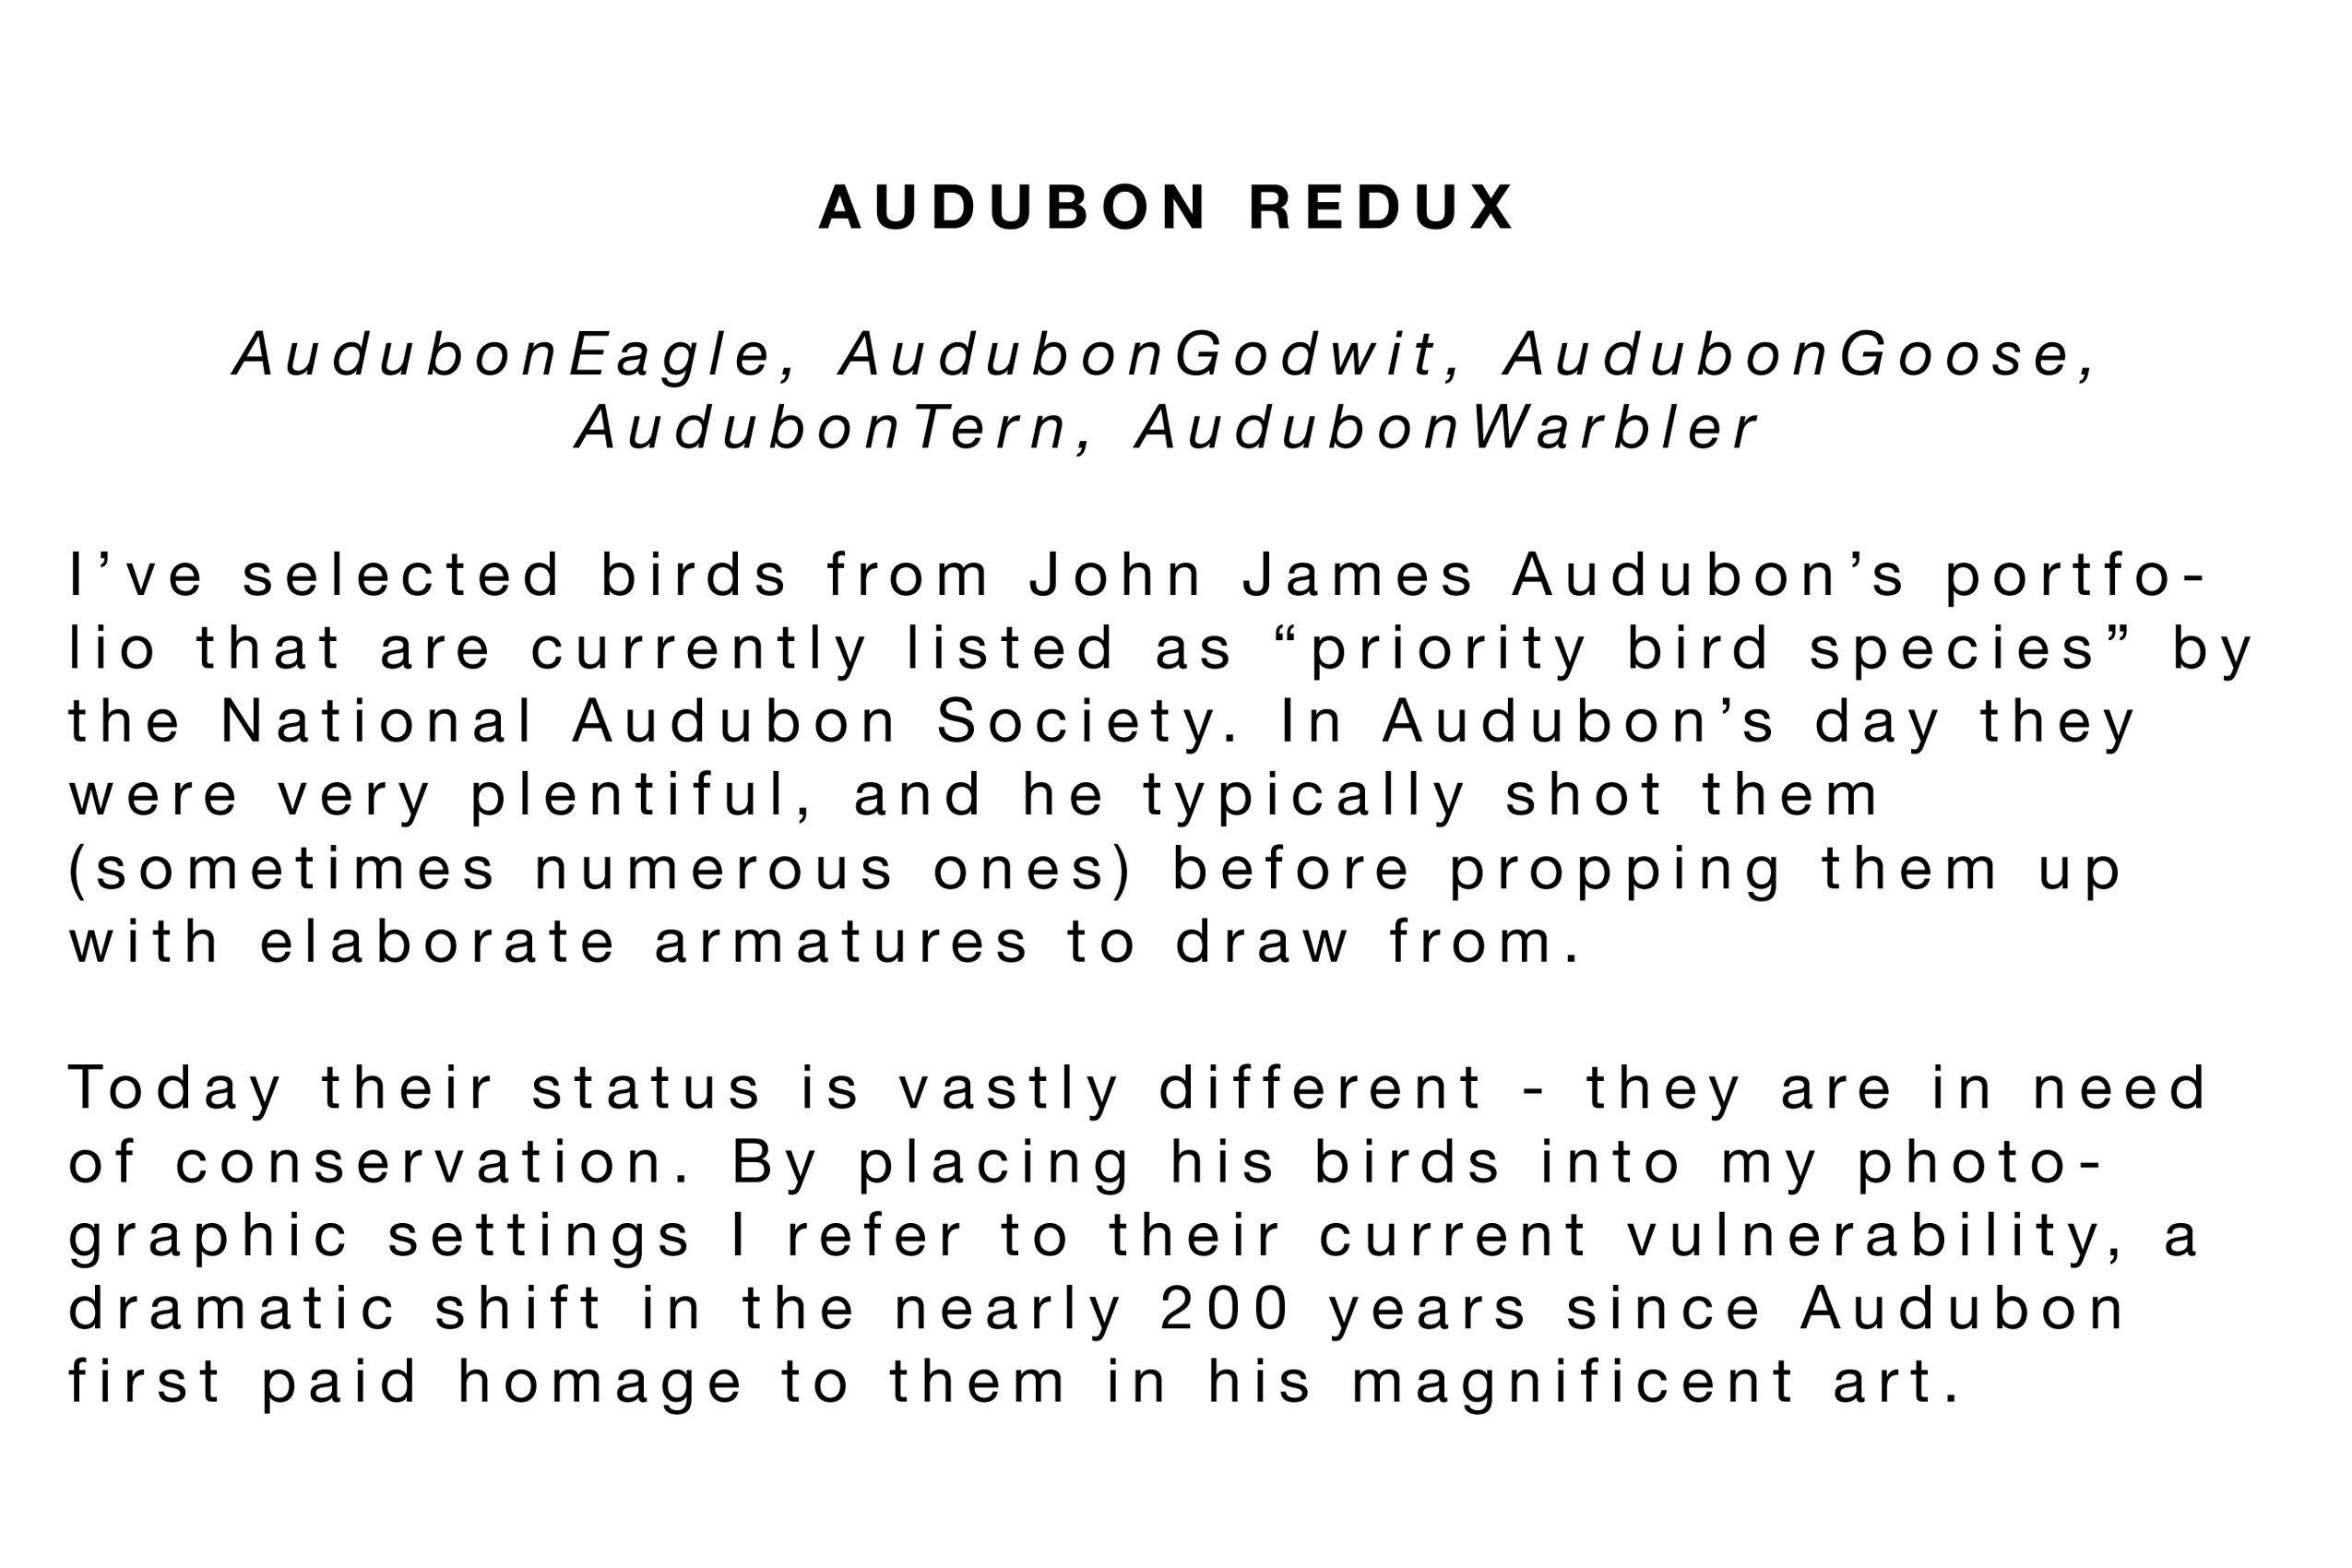 Audubon Statement